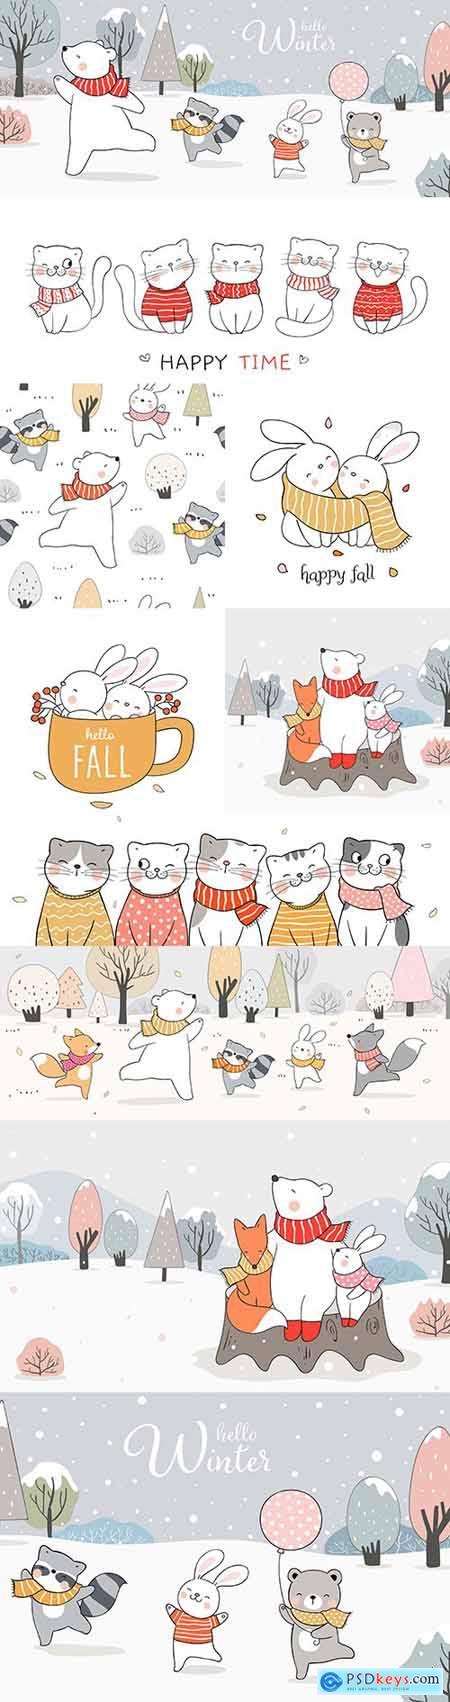 Hello winter forest animals cartoon drawn illustrations